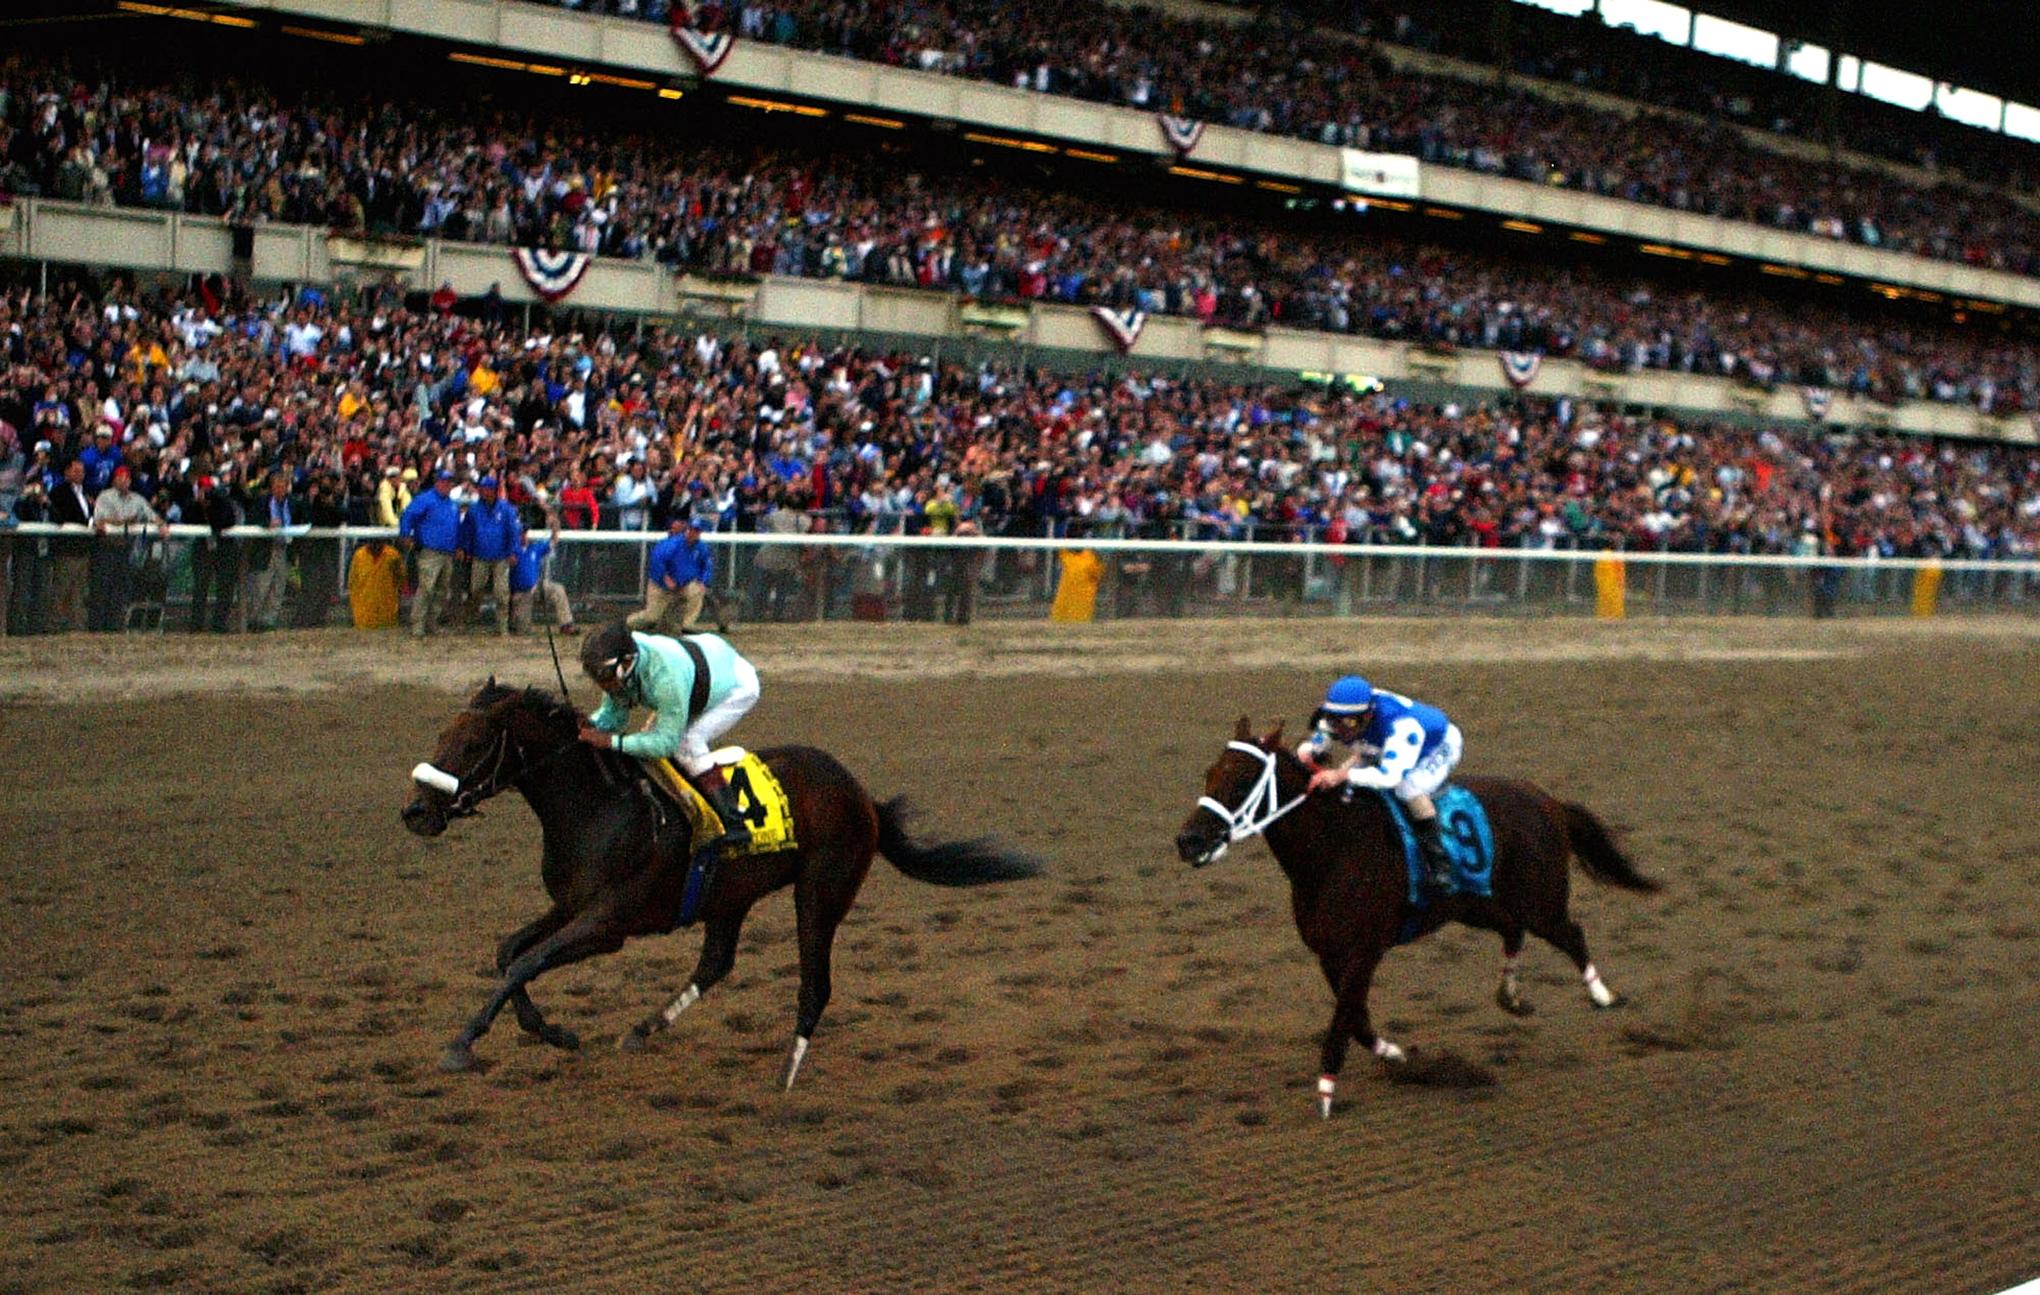 ELMONT, NEW YORK - JUNE 5: Birdstone (4), riden by Edgar Prado, overtakes Smarty Jones (9), riden by Stewart Elliott, to win the 136th Belmont Stakes on June 5, 2004 at Belmont Park in Elmont, New York. (Photo by Al Bello/Getty Images)